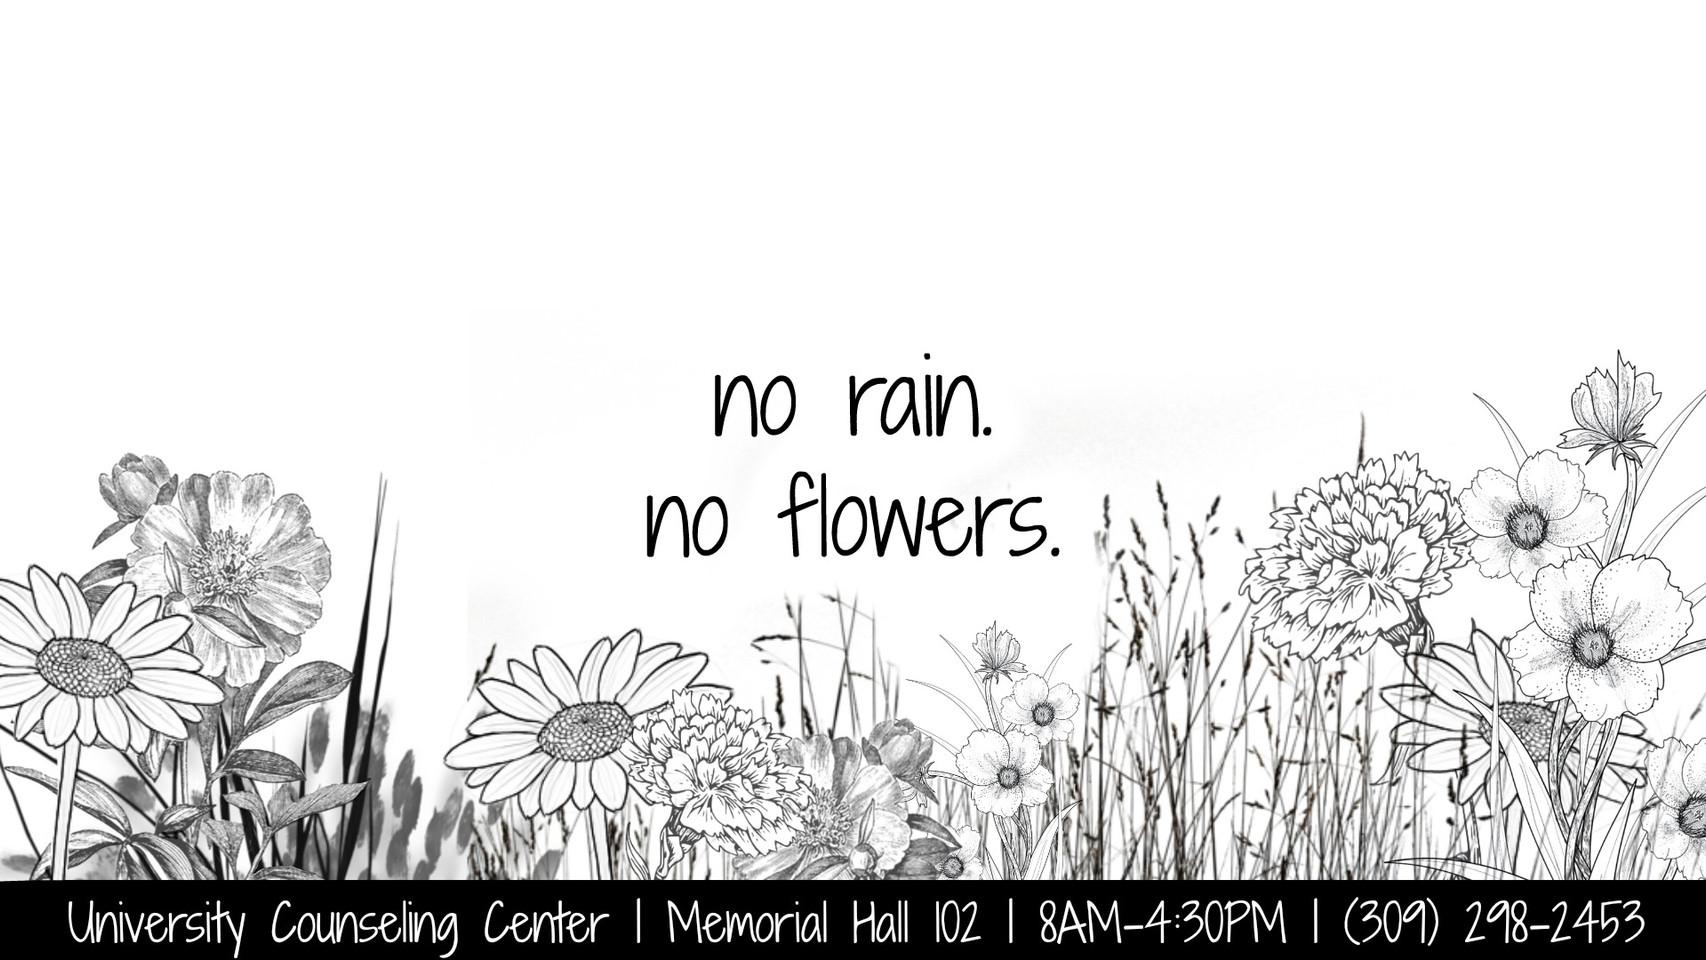 norainnoflowers.jpg